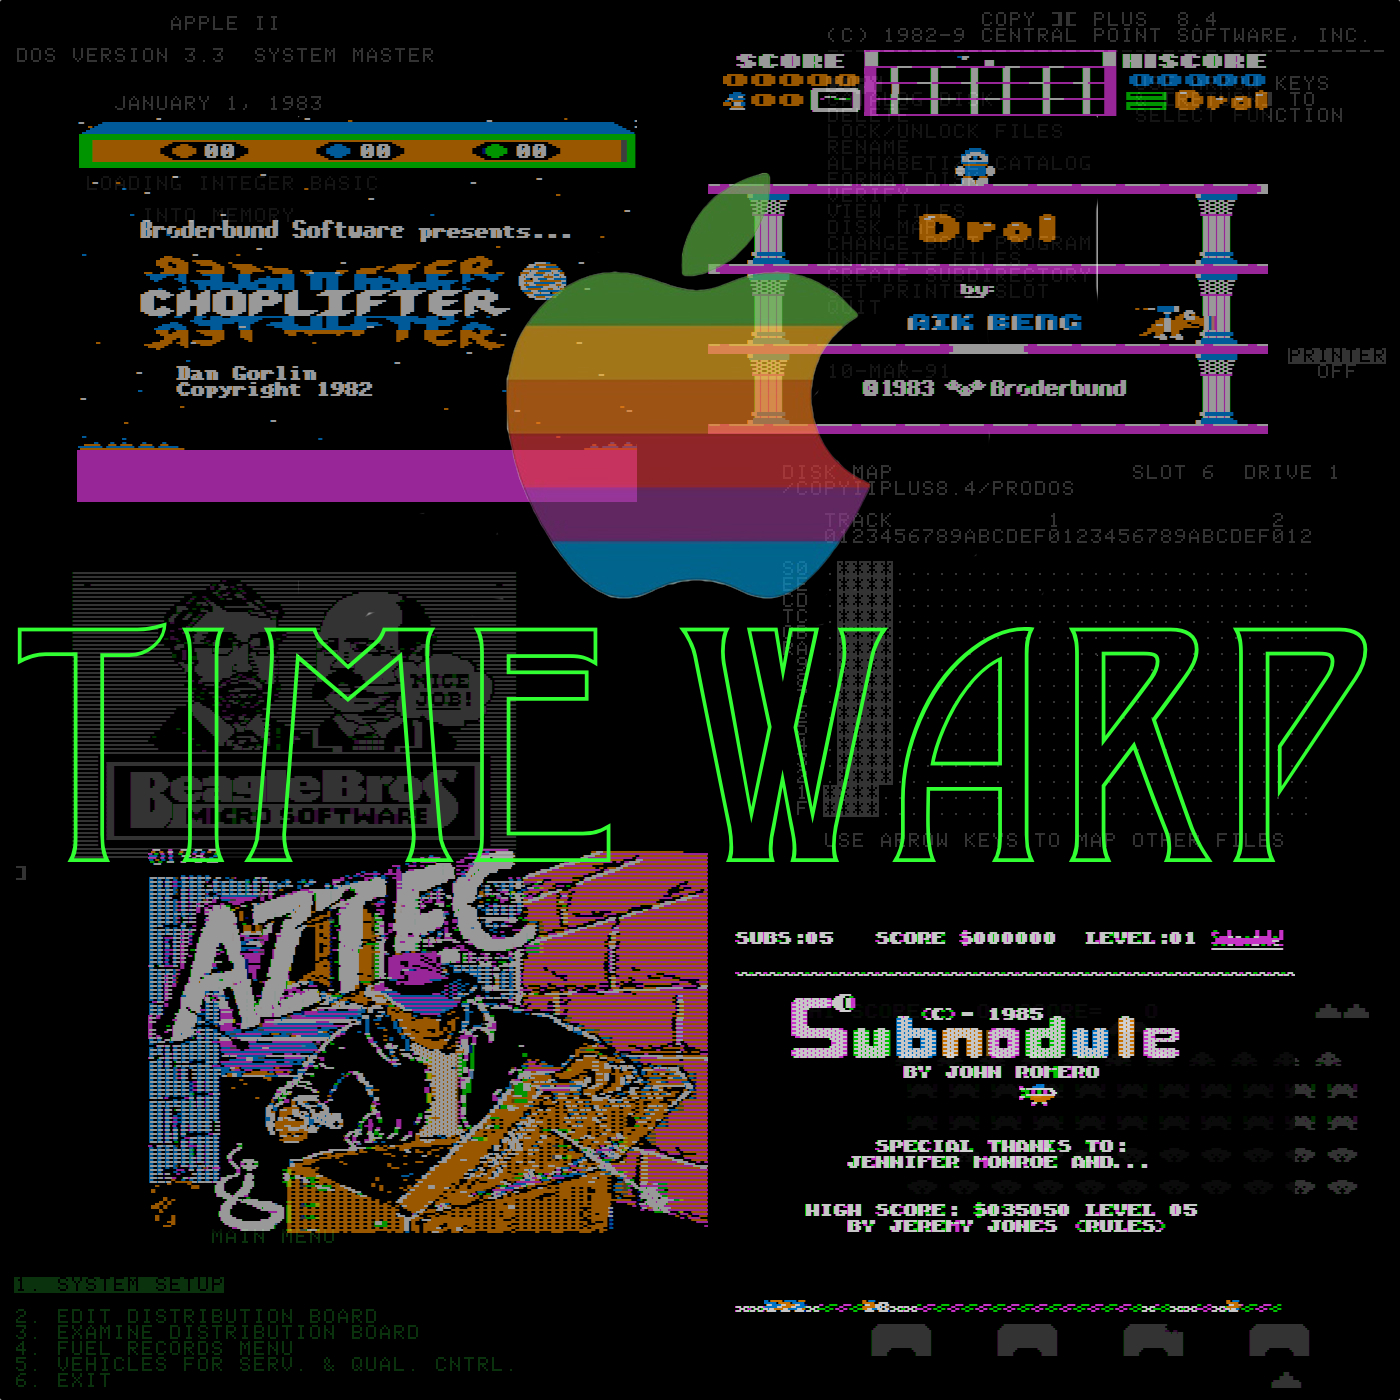 Apple Time Warp show art